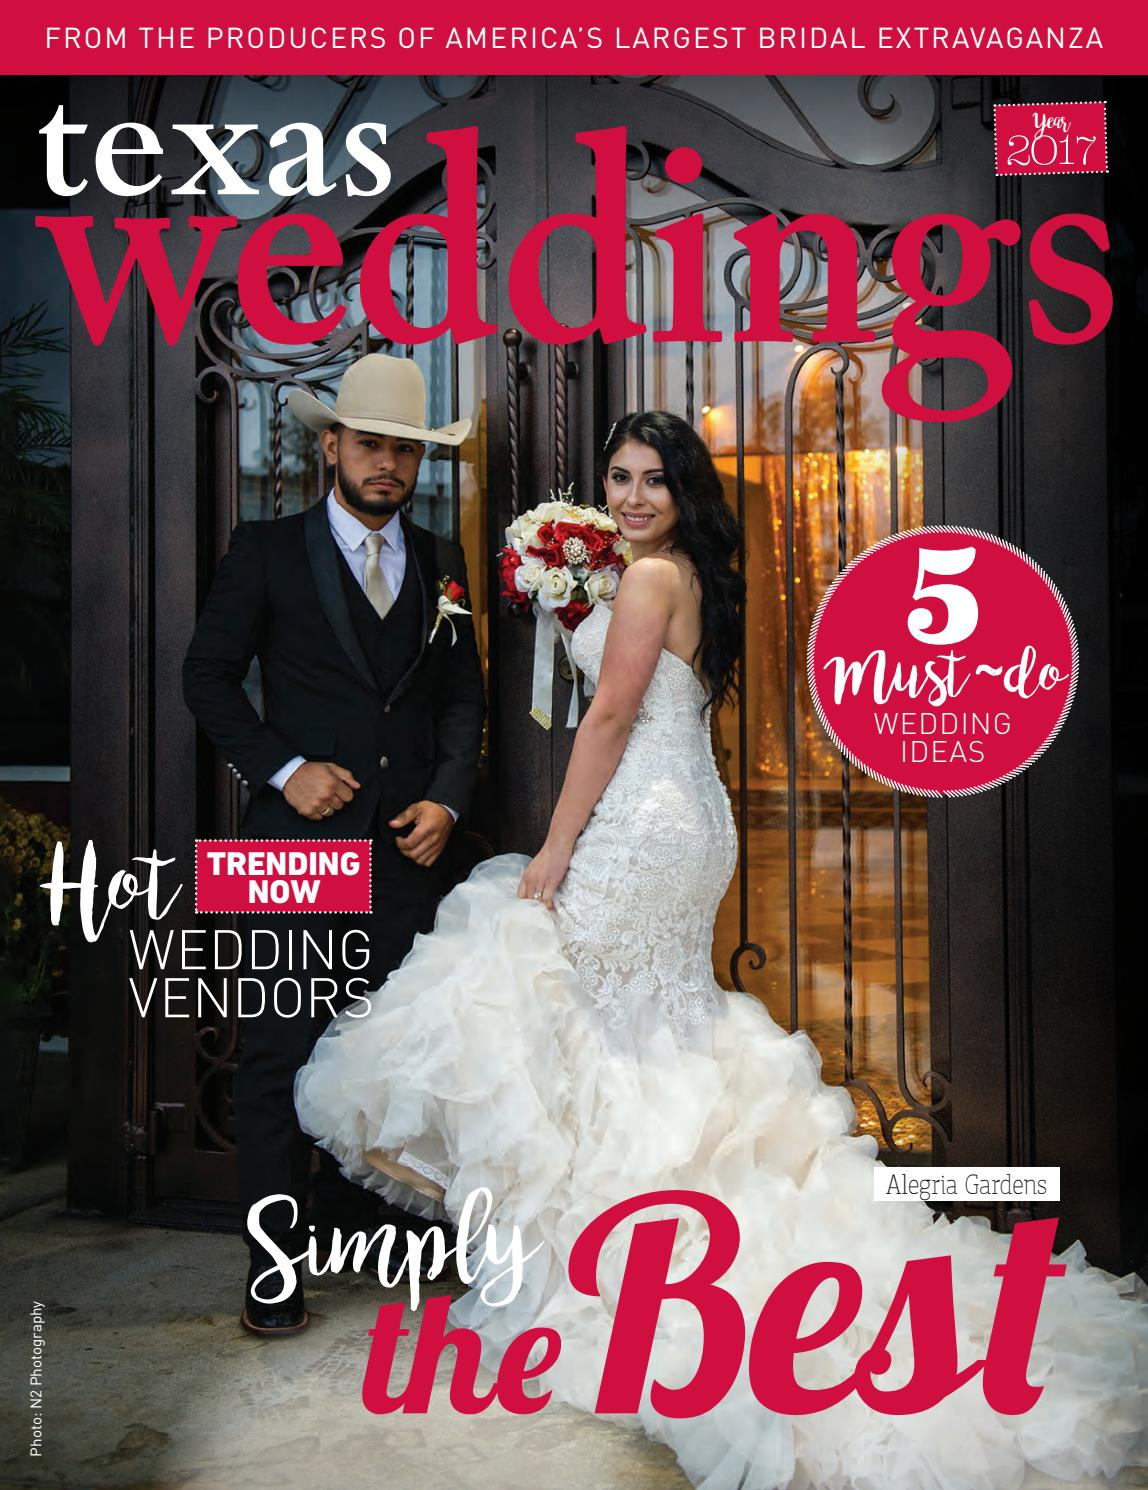 Dallas Wedding Texas Bridal Shower Personalized Napkins Austin Wedding Texas Destination Wedding Wedding Favors Texas Travel Wedding